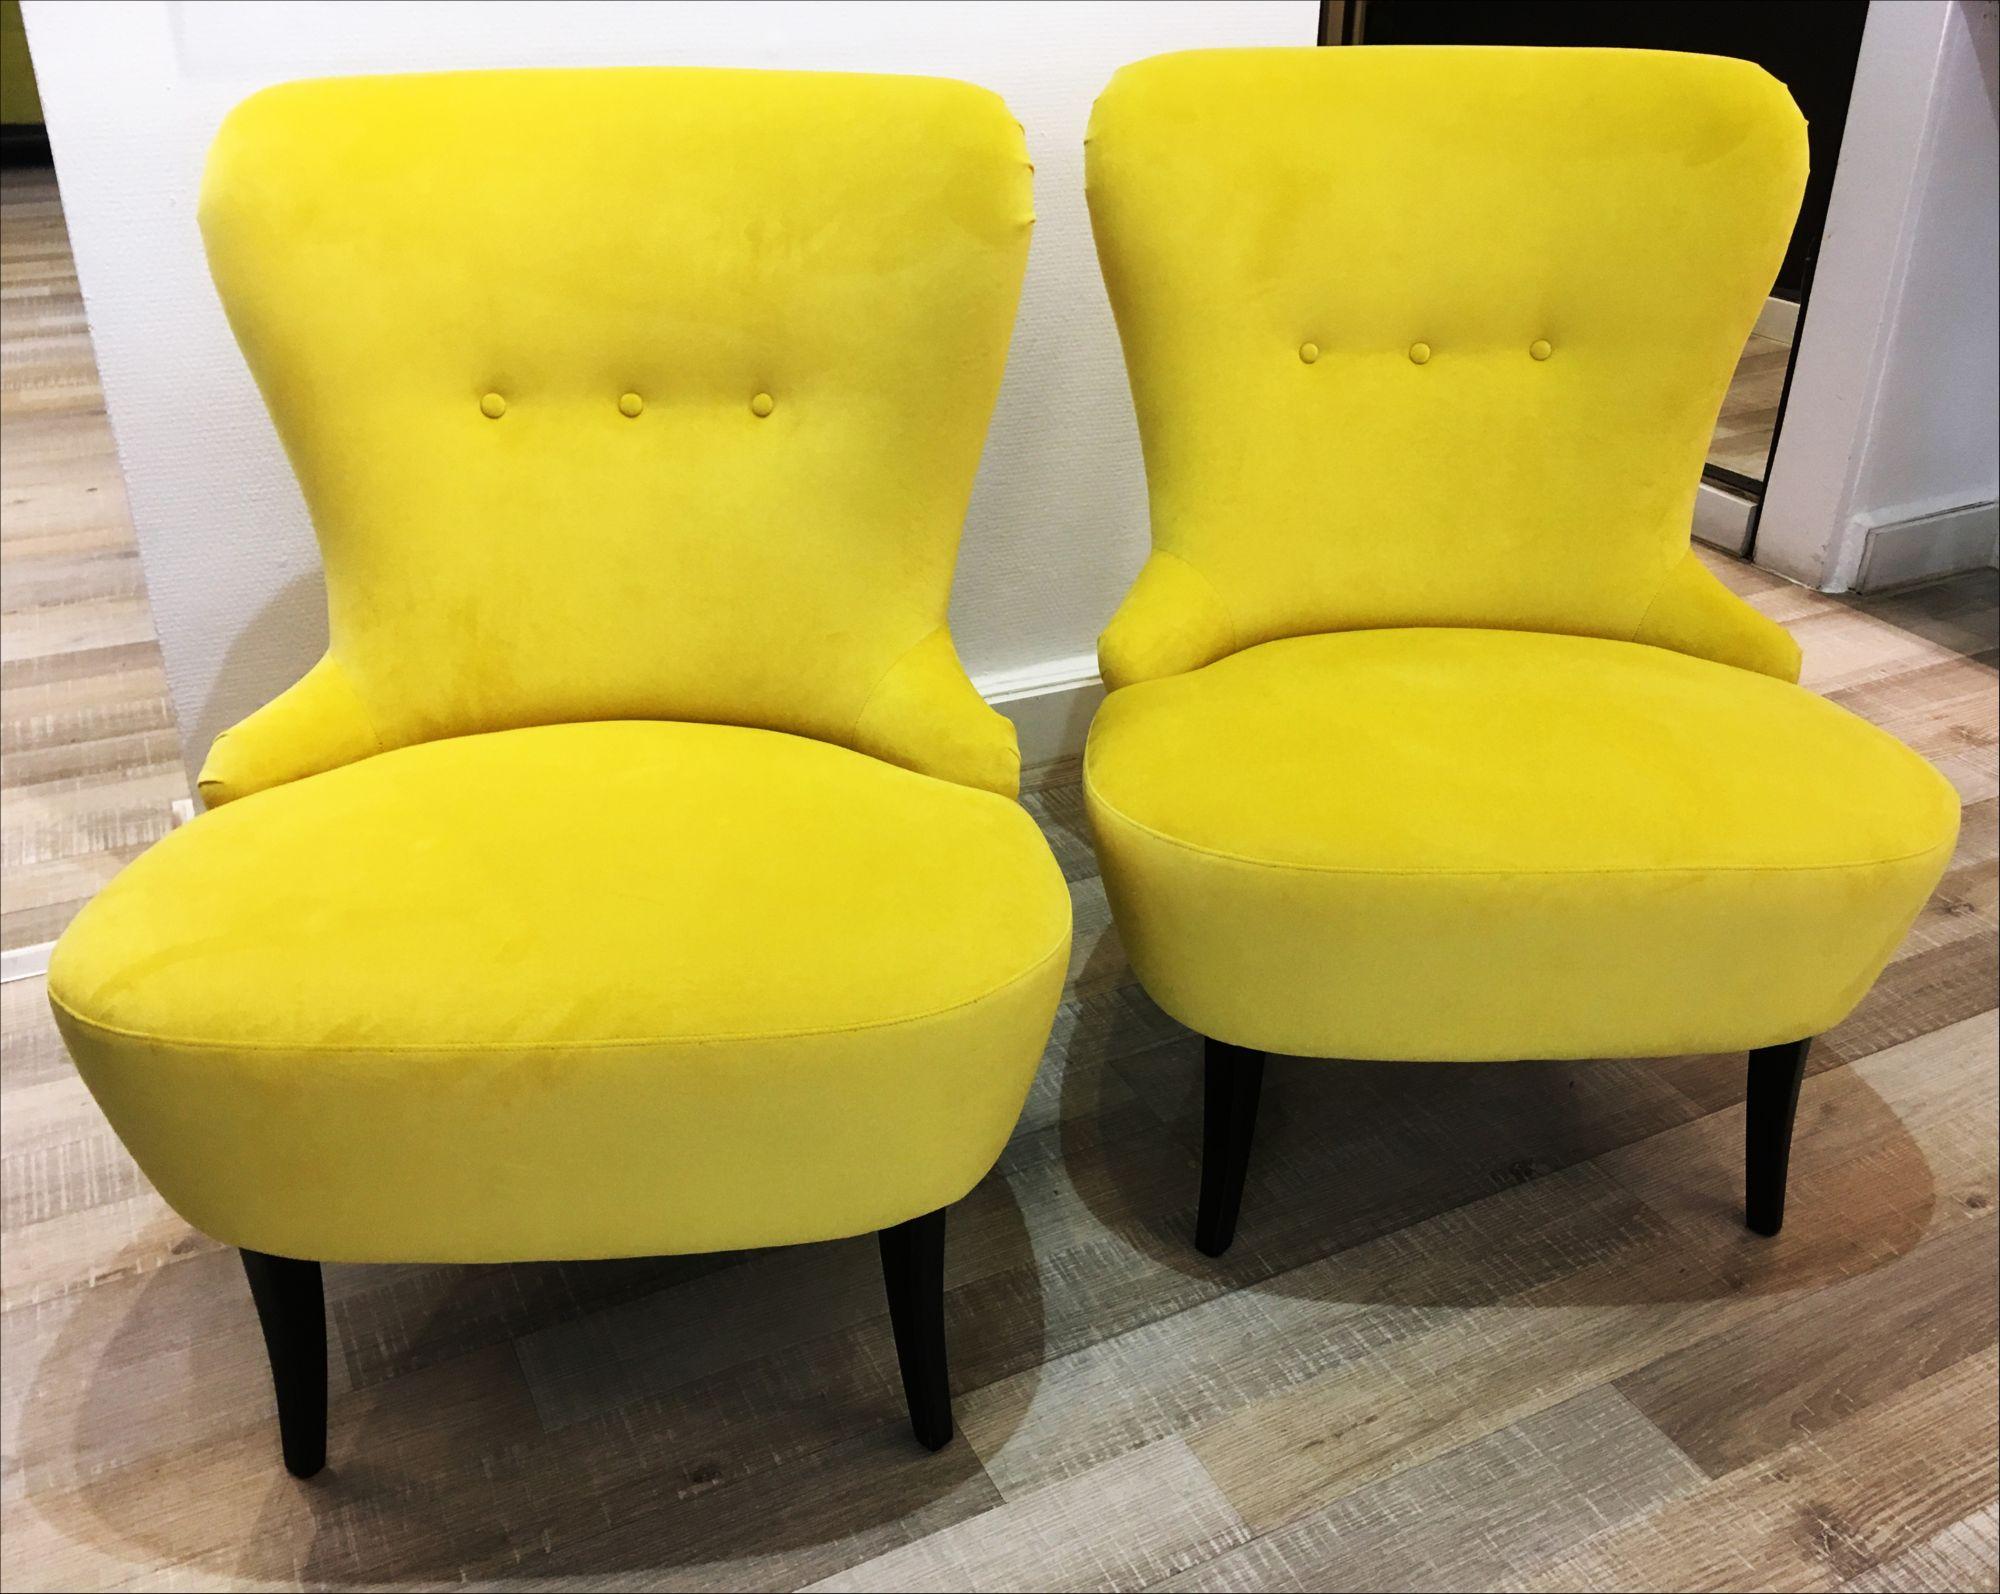 https://artorigo.com/ao_products/4328/l/furniture-chairs-1930-1939-art-deco-bardoni-interieur-20563.JPG